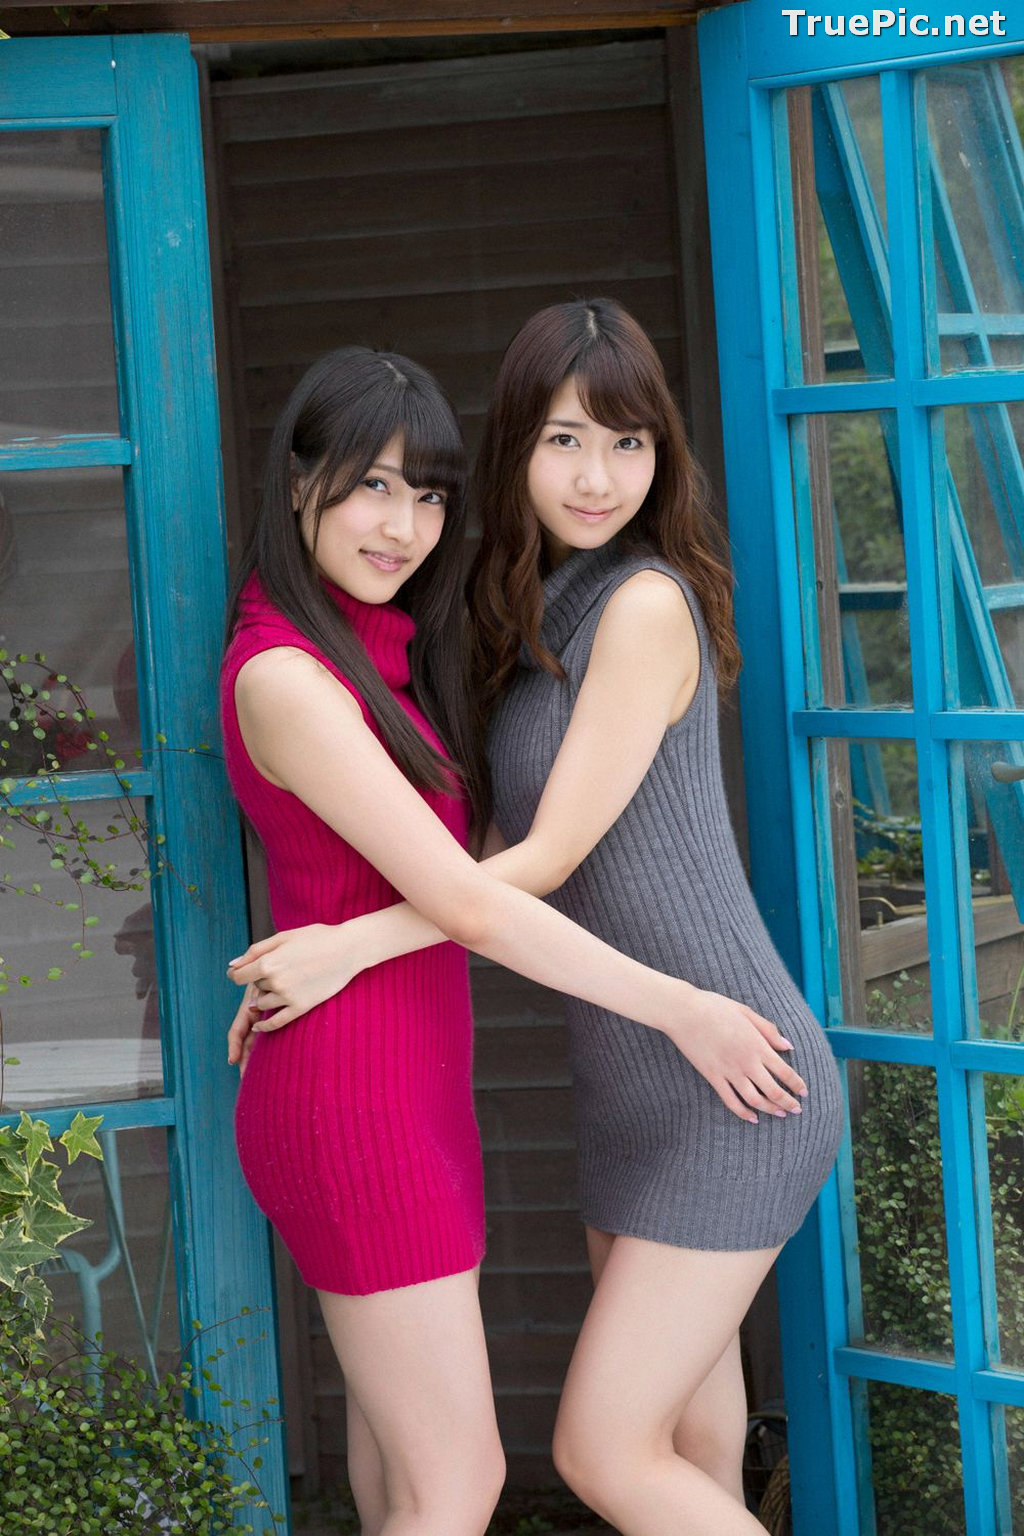 Image YS Web Vol.633 - Japanese Model - Yuki Kashiwagi & Anna Iriyama - TruePic.net - Picture-3